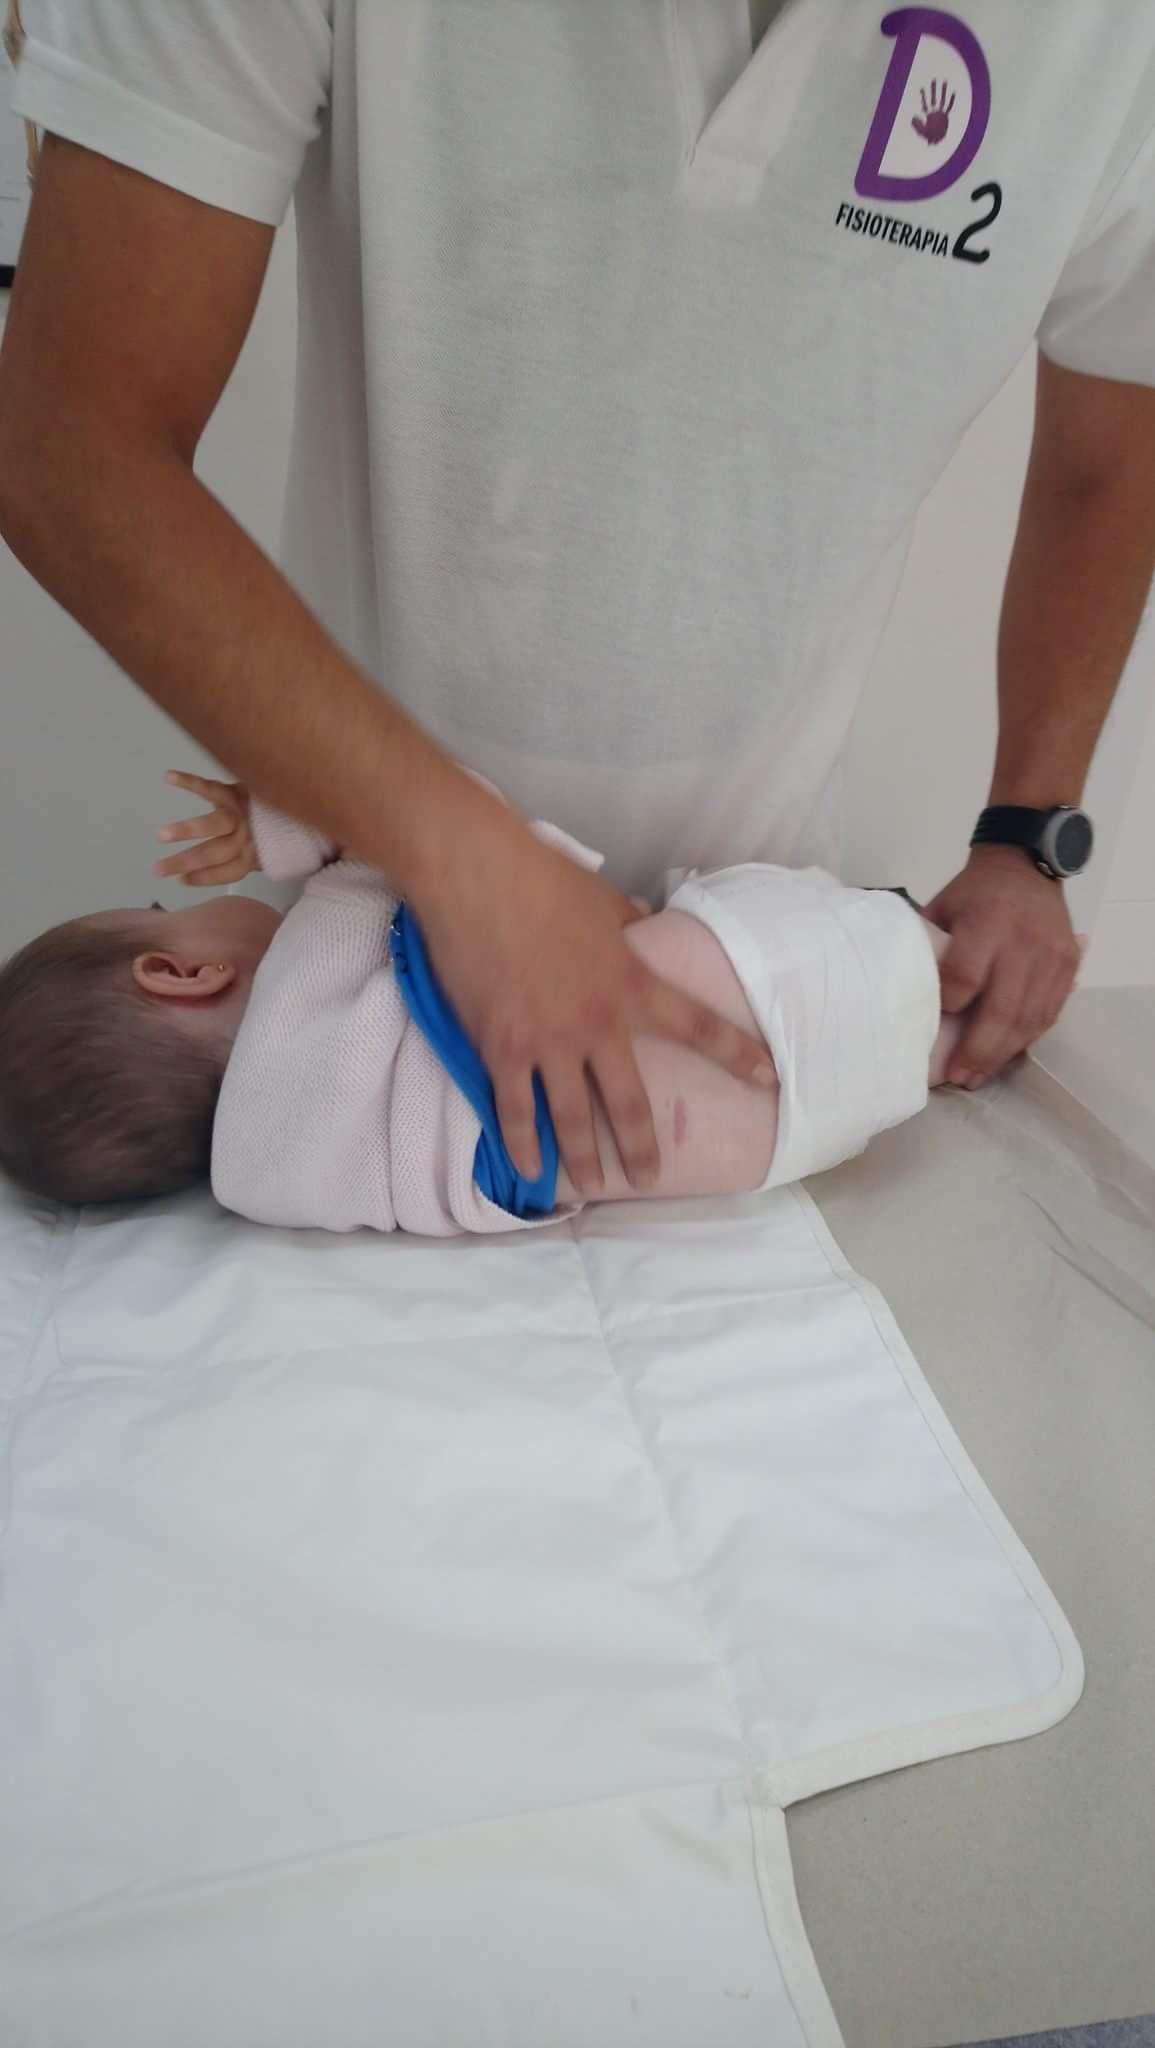 Le mejor terapia para cólicos lactantes en Fisioterapia D2